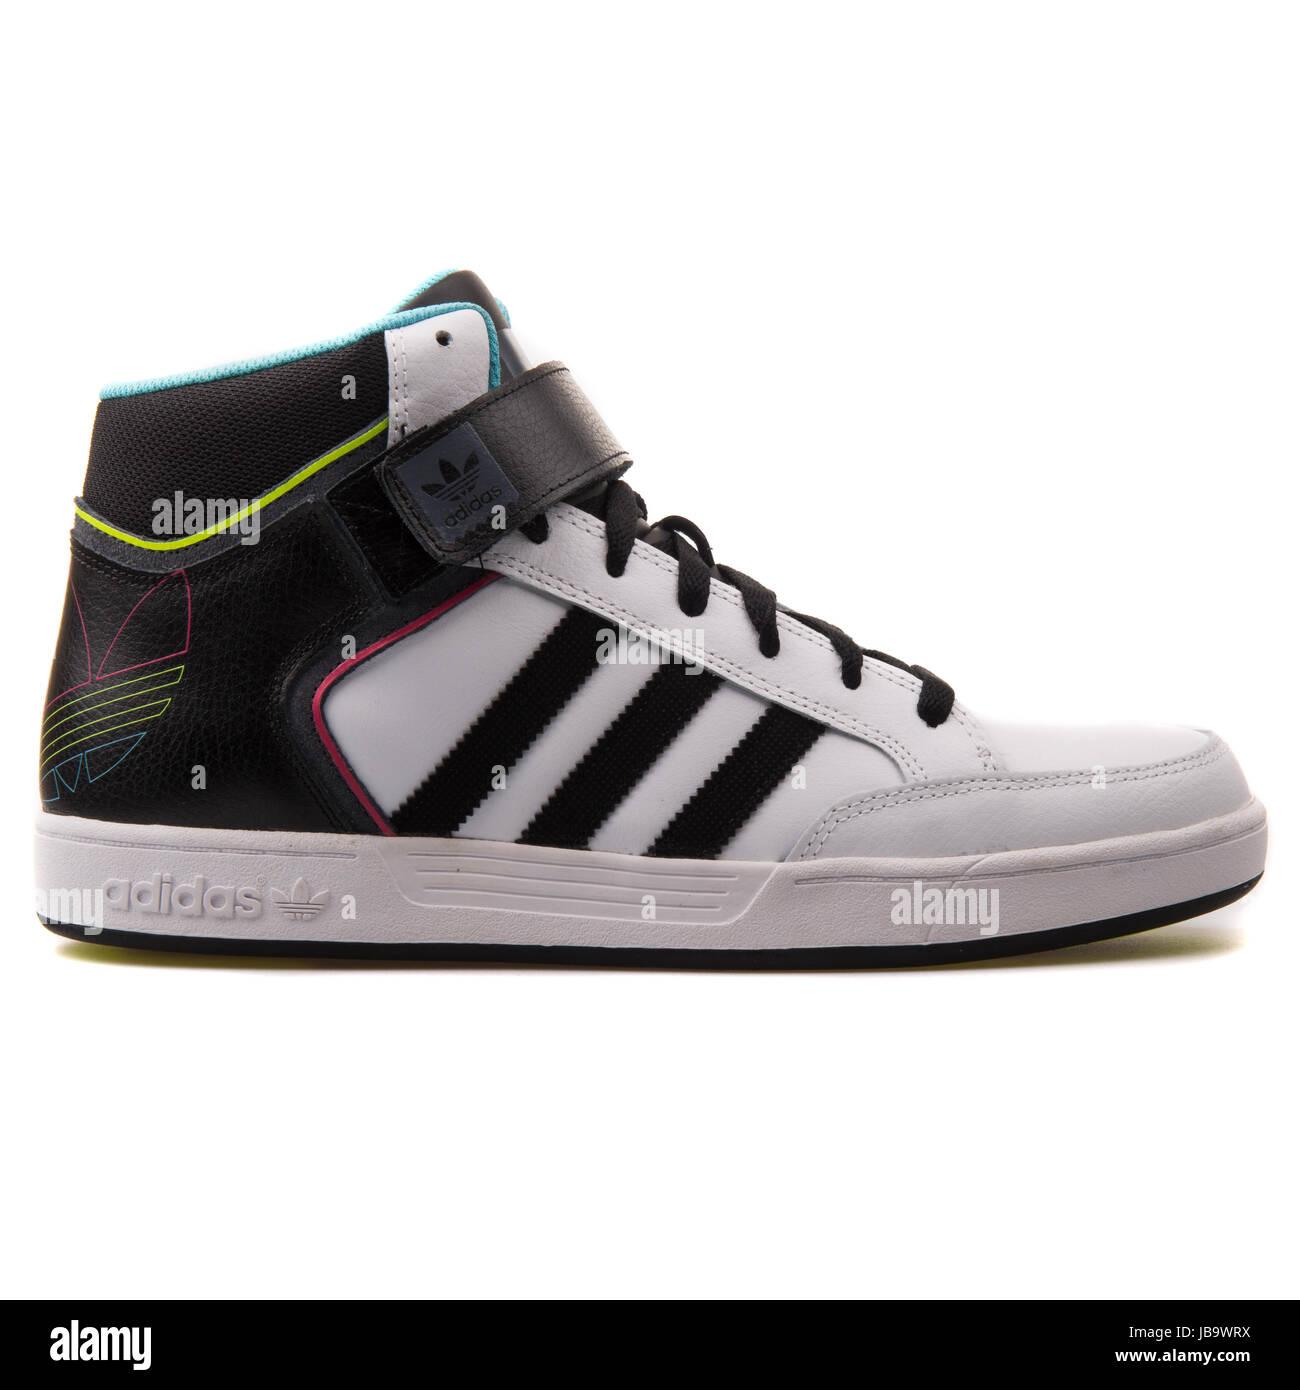 Adidas Varial metà bianco e nero uomini scarpe Skateboarding - D68665  Immagini Stock fe331be05cc